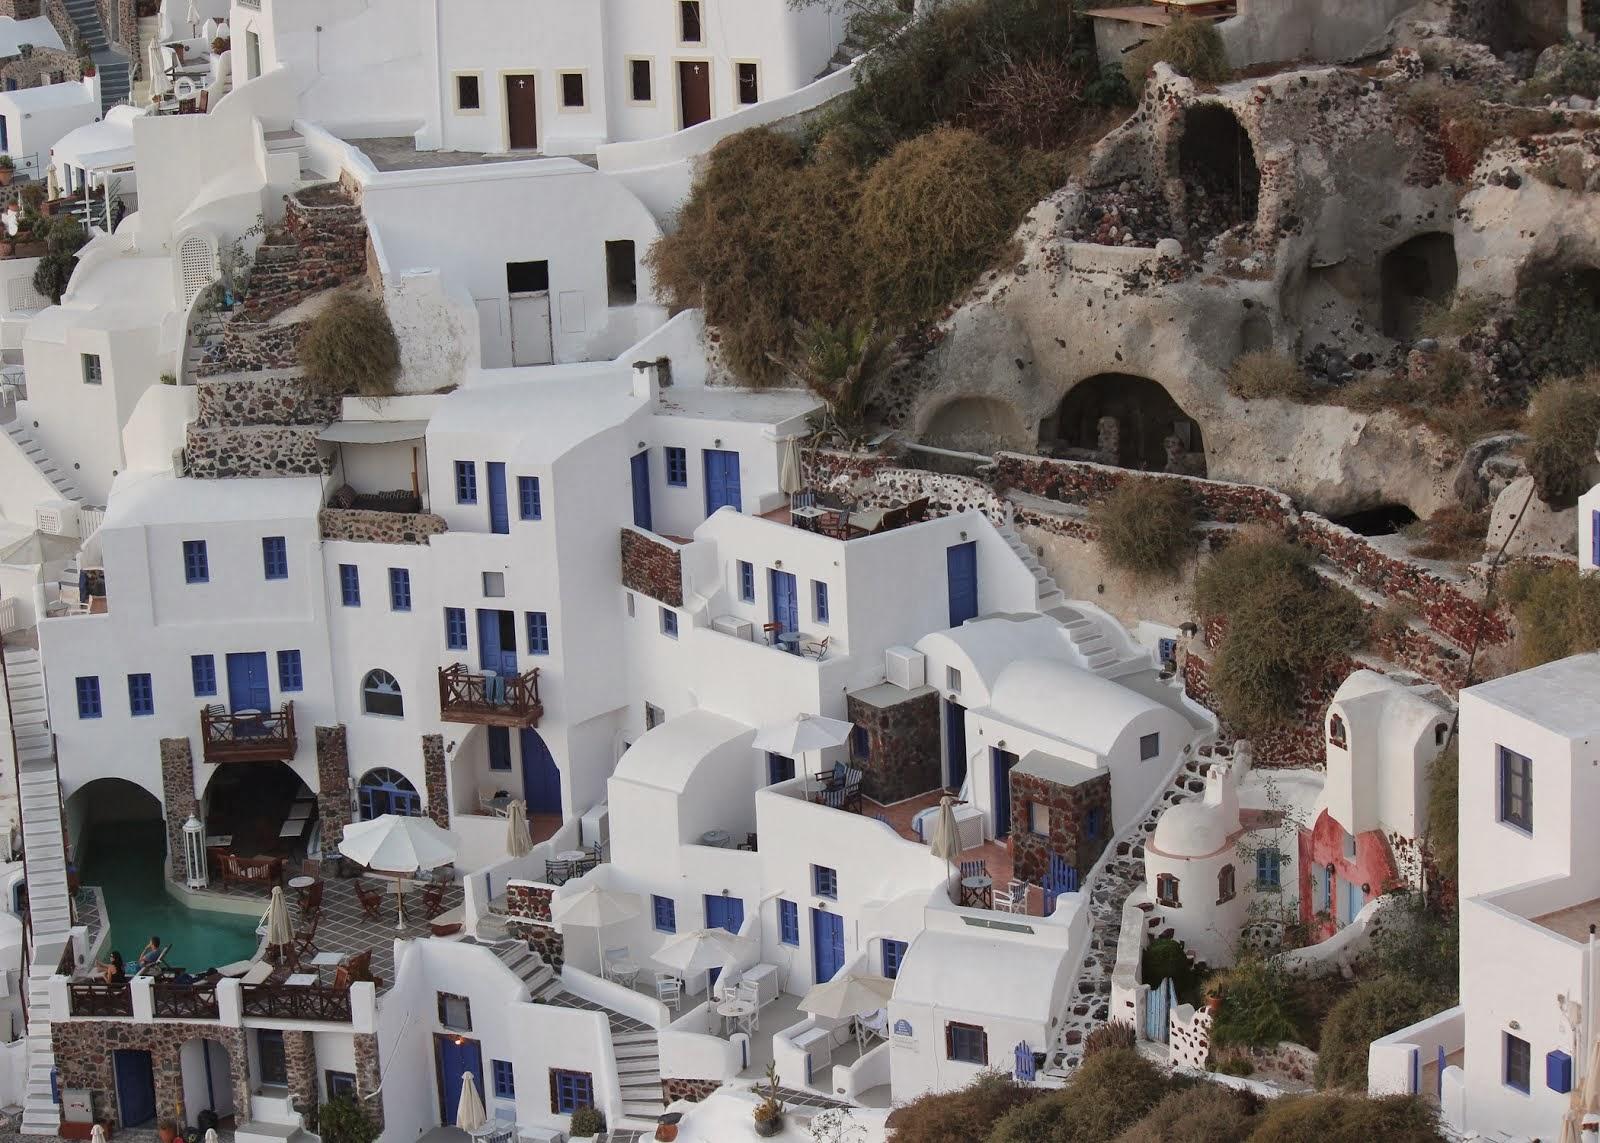 Oia (ee-ah) Santorini